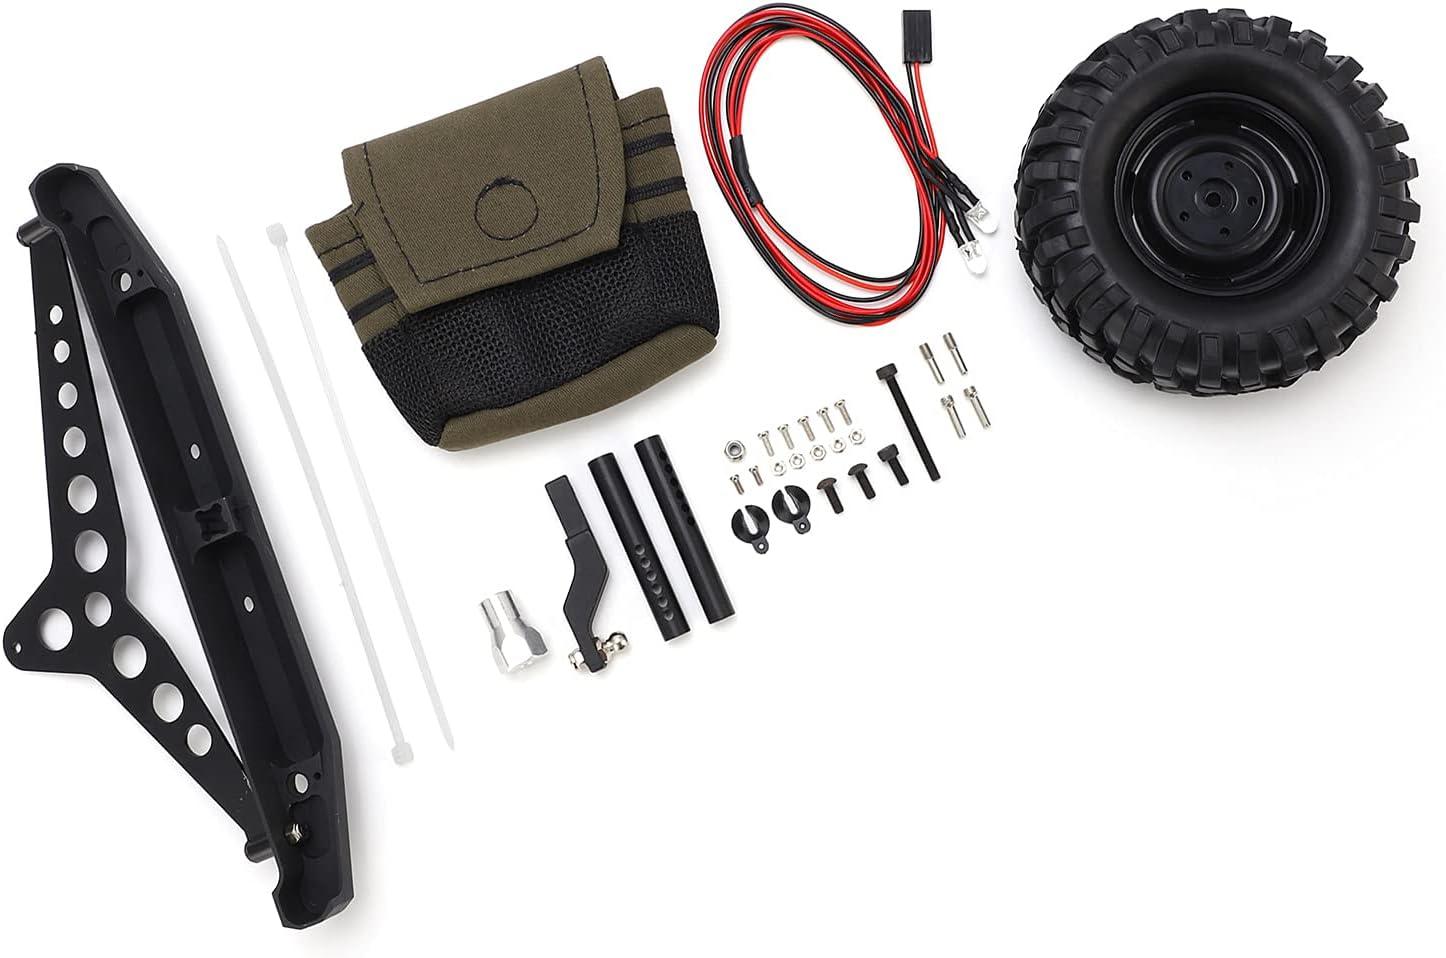 Popular brand Jopwkuin RC Rear Bumper Spare Tire Set More Durable Industry No. 1 Bum